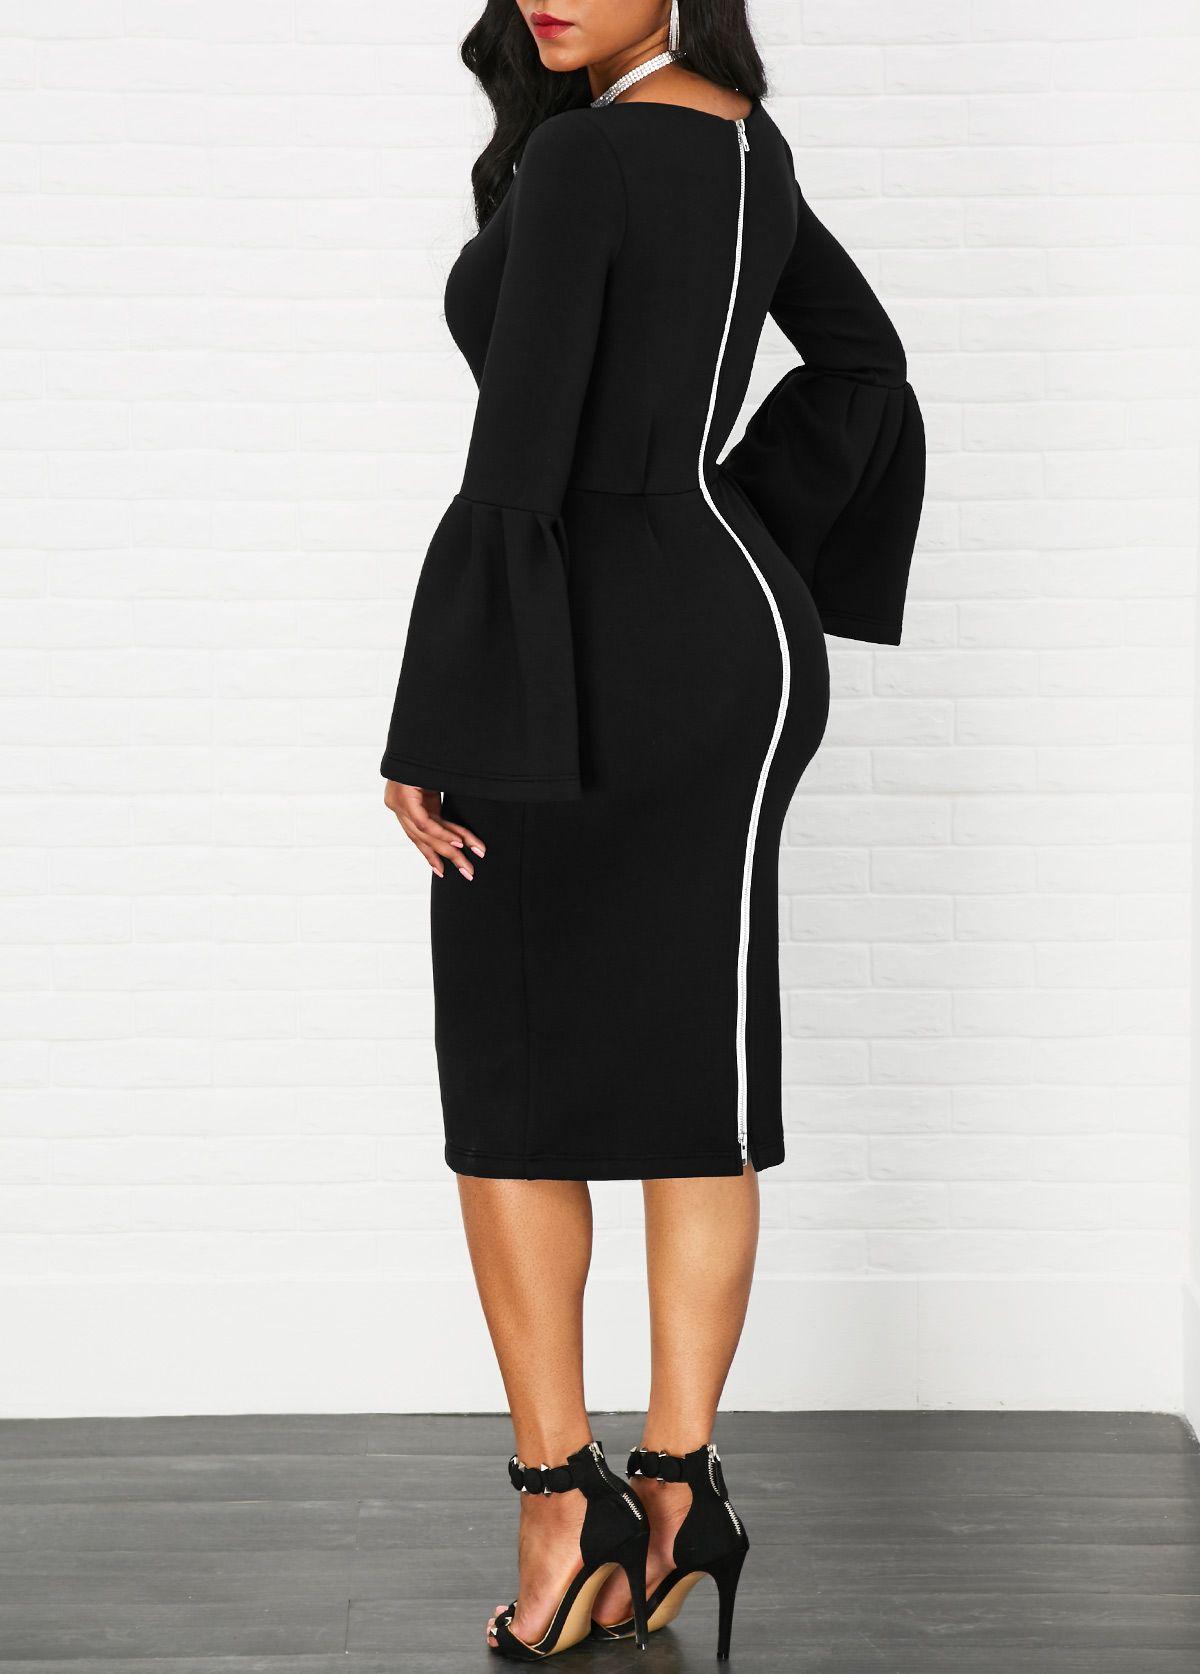 High Waist Zipper Back Flare Sleeve Black Dress Rotita Com Usd 32 77 Shop Casual Dresses Fashion Clothes [ 1674 x 1200 Pixel ]